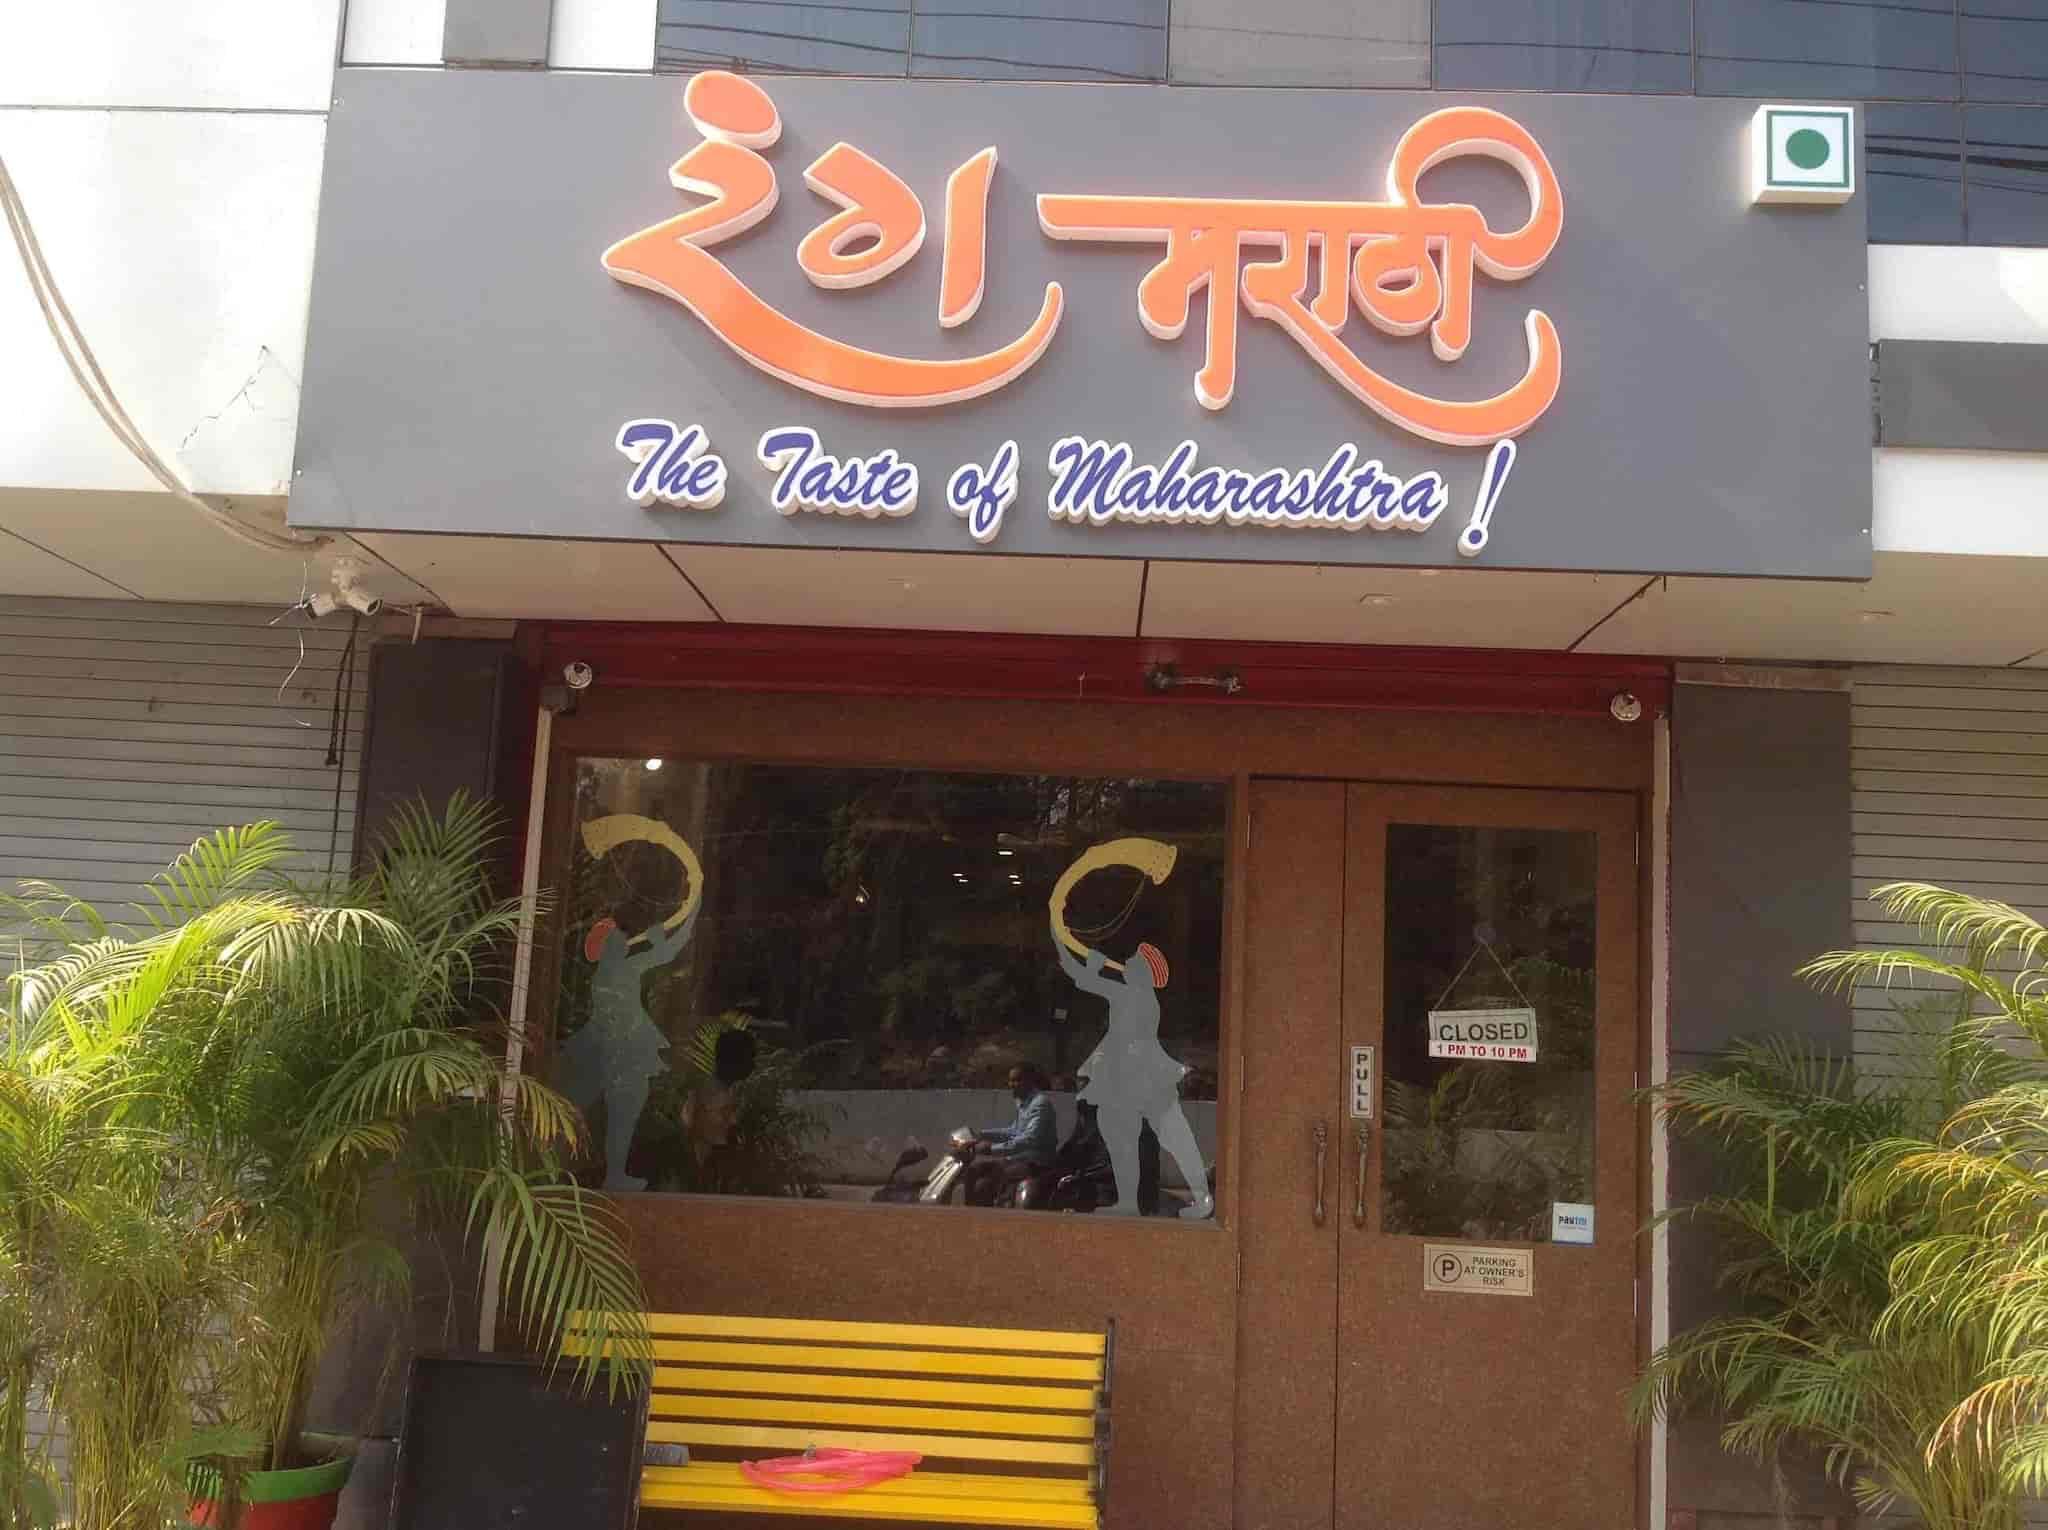 Rang Marathi Restaurant, Kesar Baug Road, Indore - Restaurants